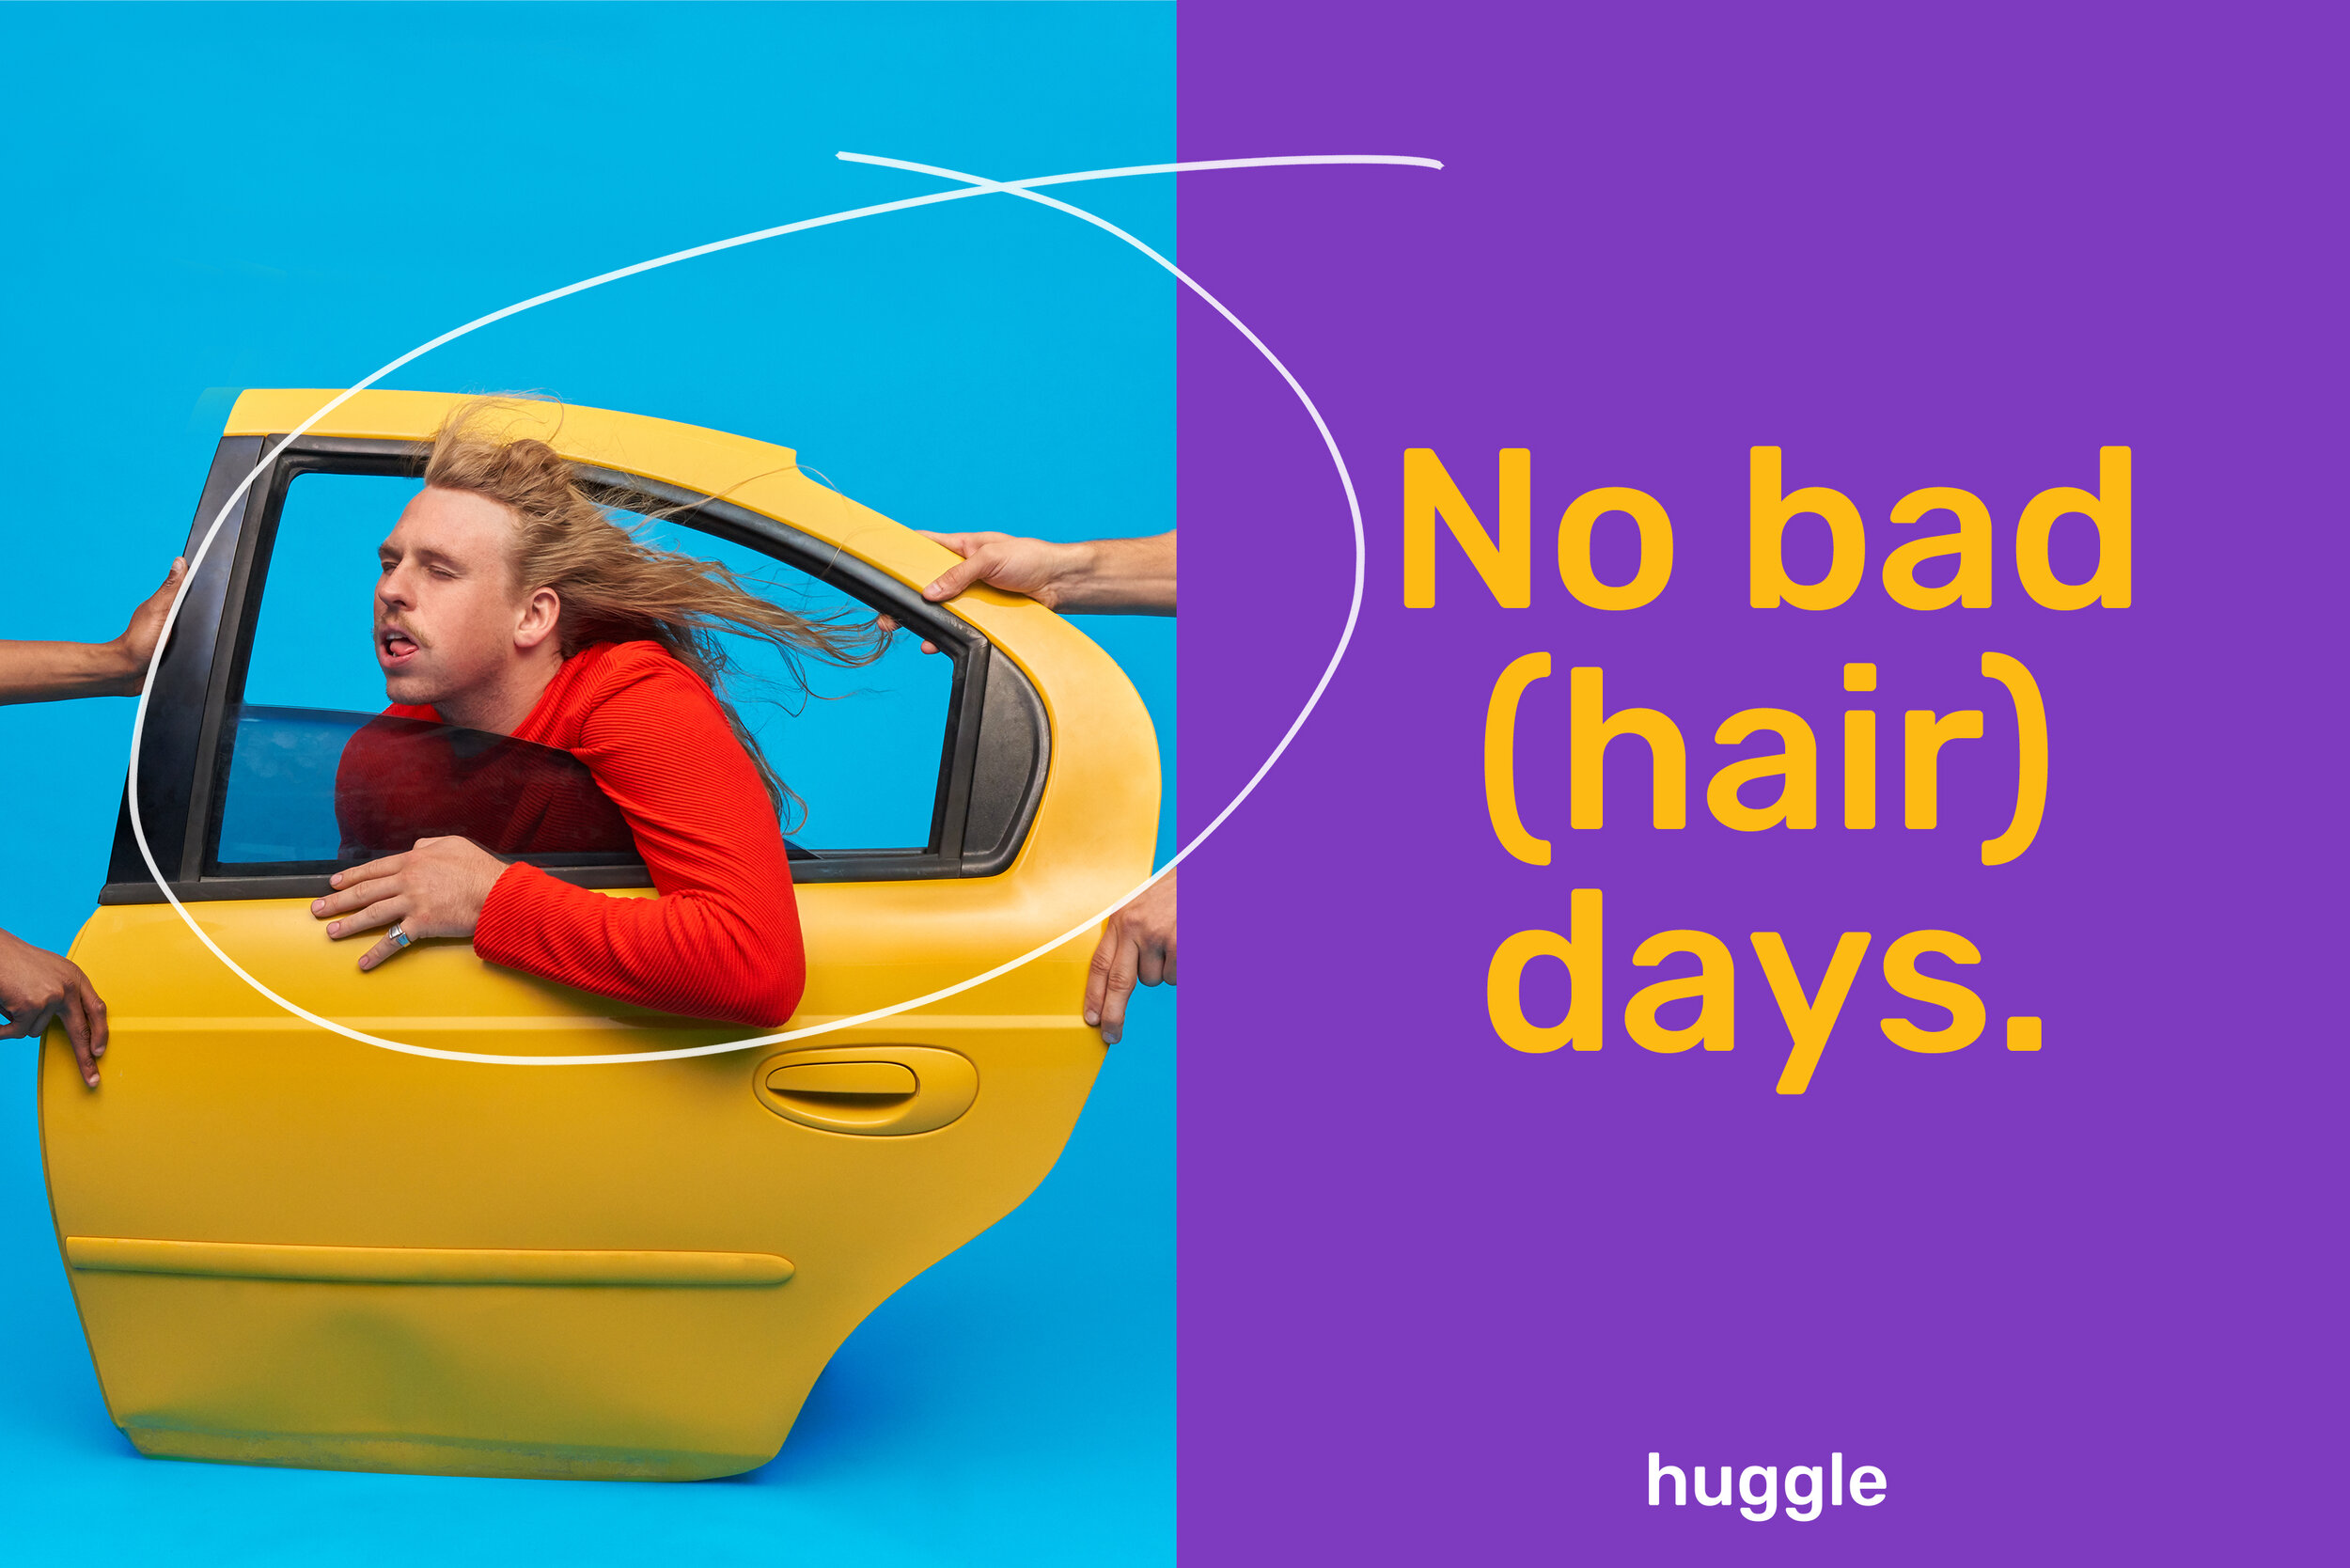 Huggle_Layout3.jpg